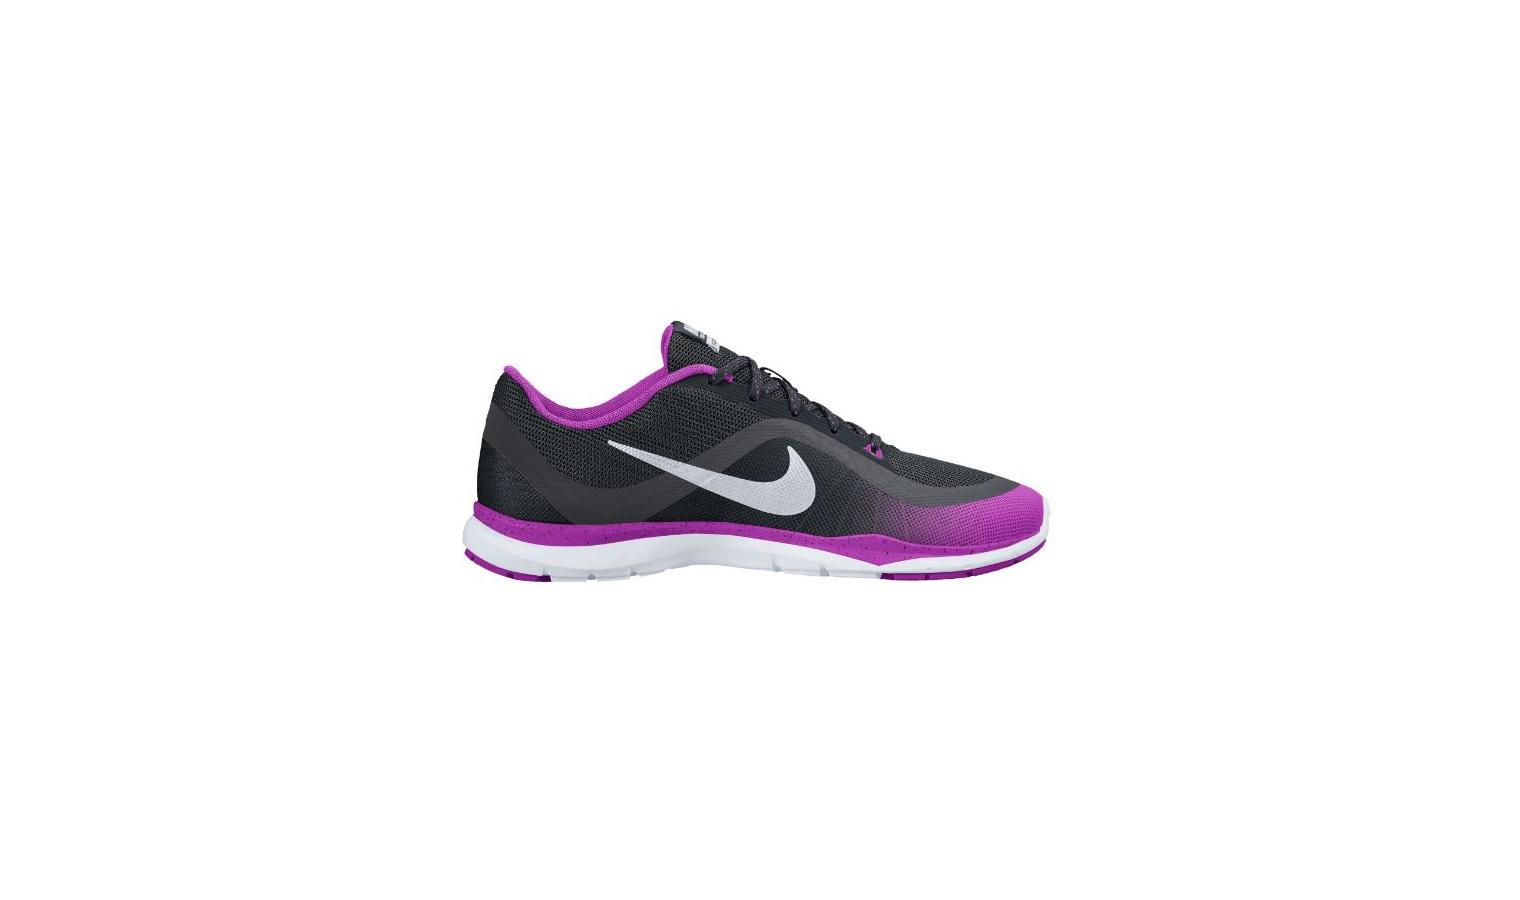 Dámská Fitness obuv Nike FLEX TRAINER 6 PRINT černá  bd03d6d3f6